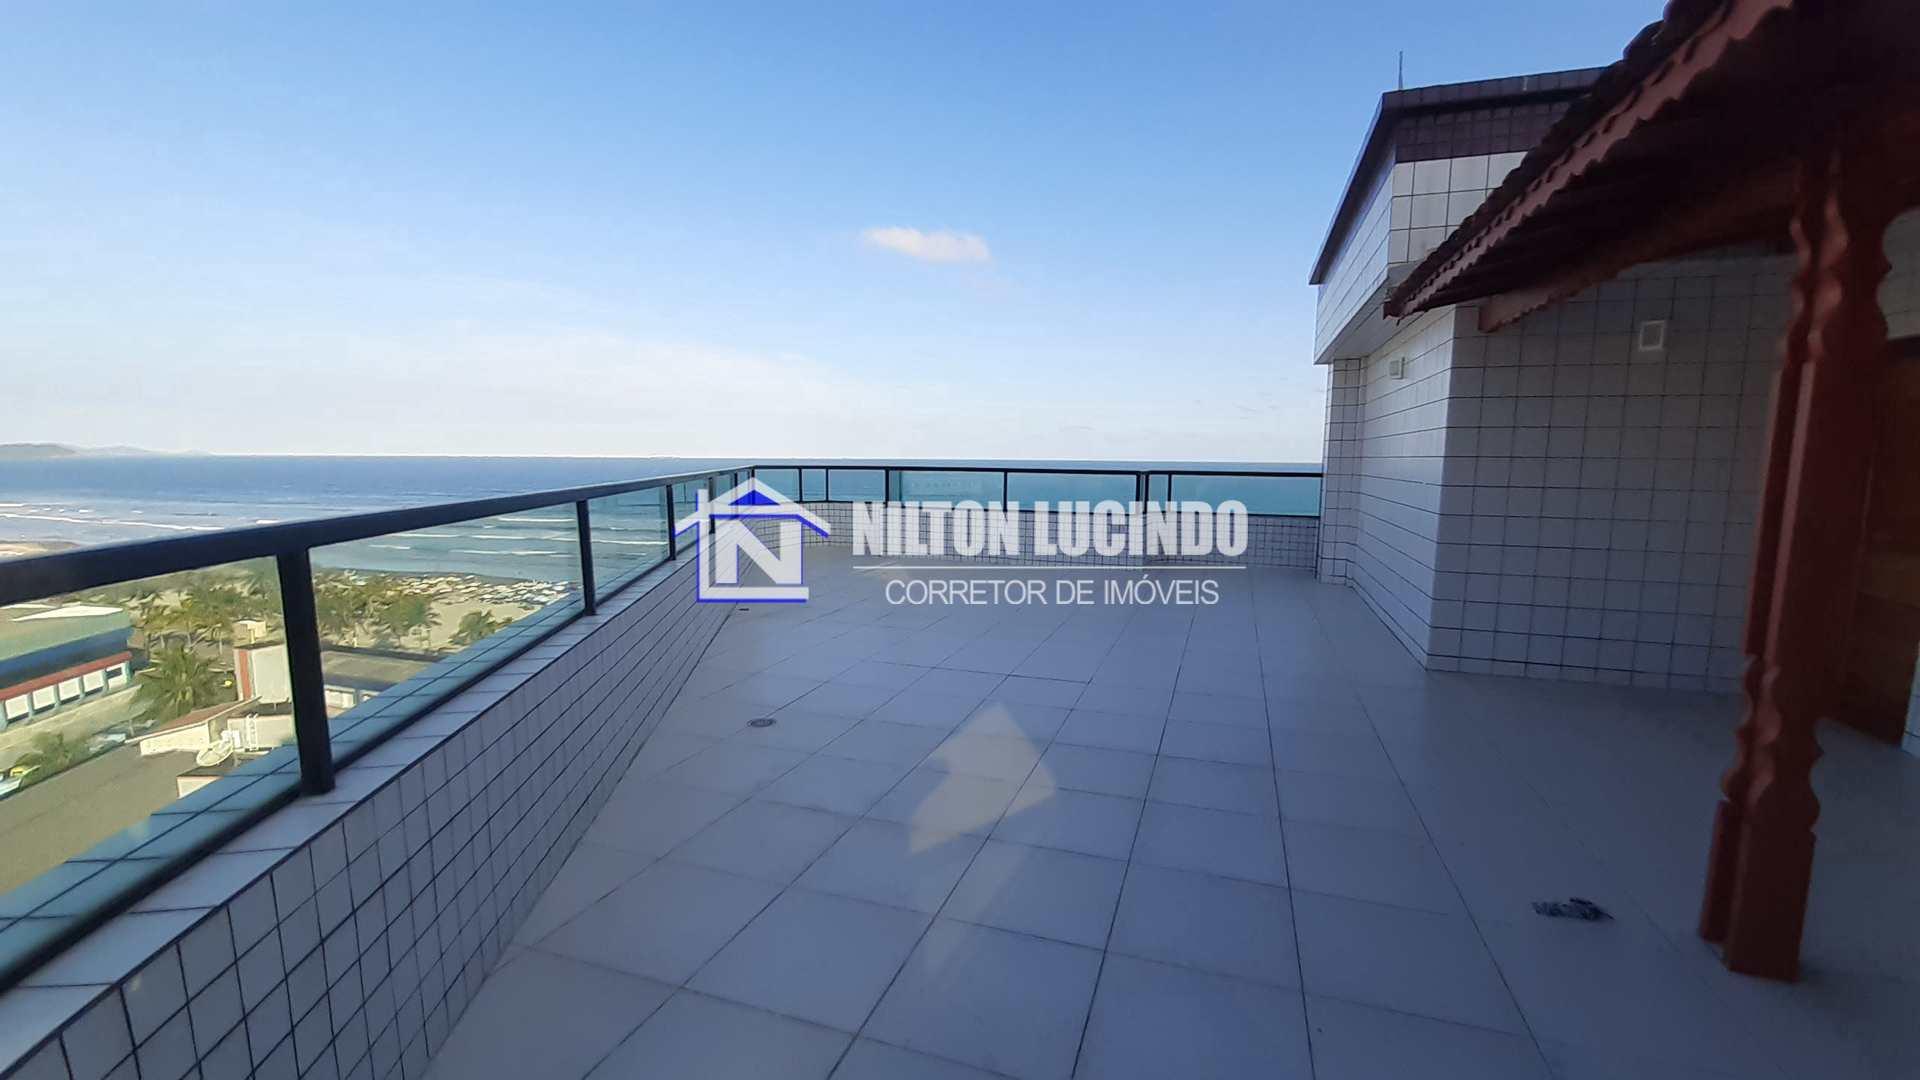 Cobertura com 3 dorms, Mirim, Praia Grande - R$ 400 mil, Cod: 10201